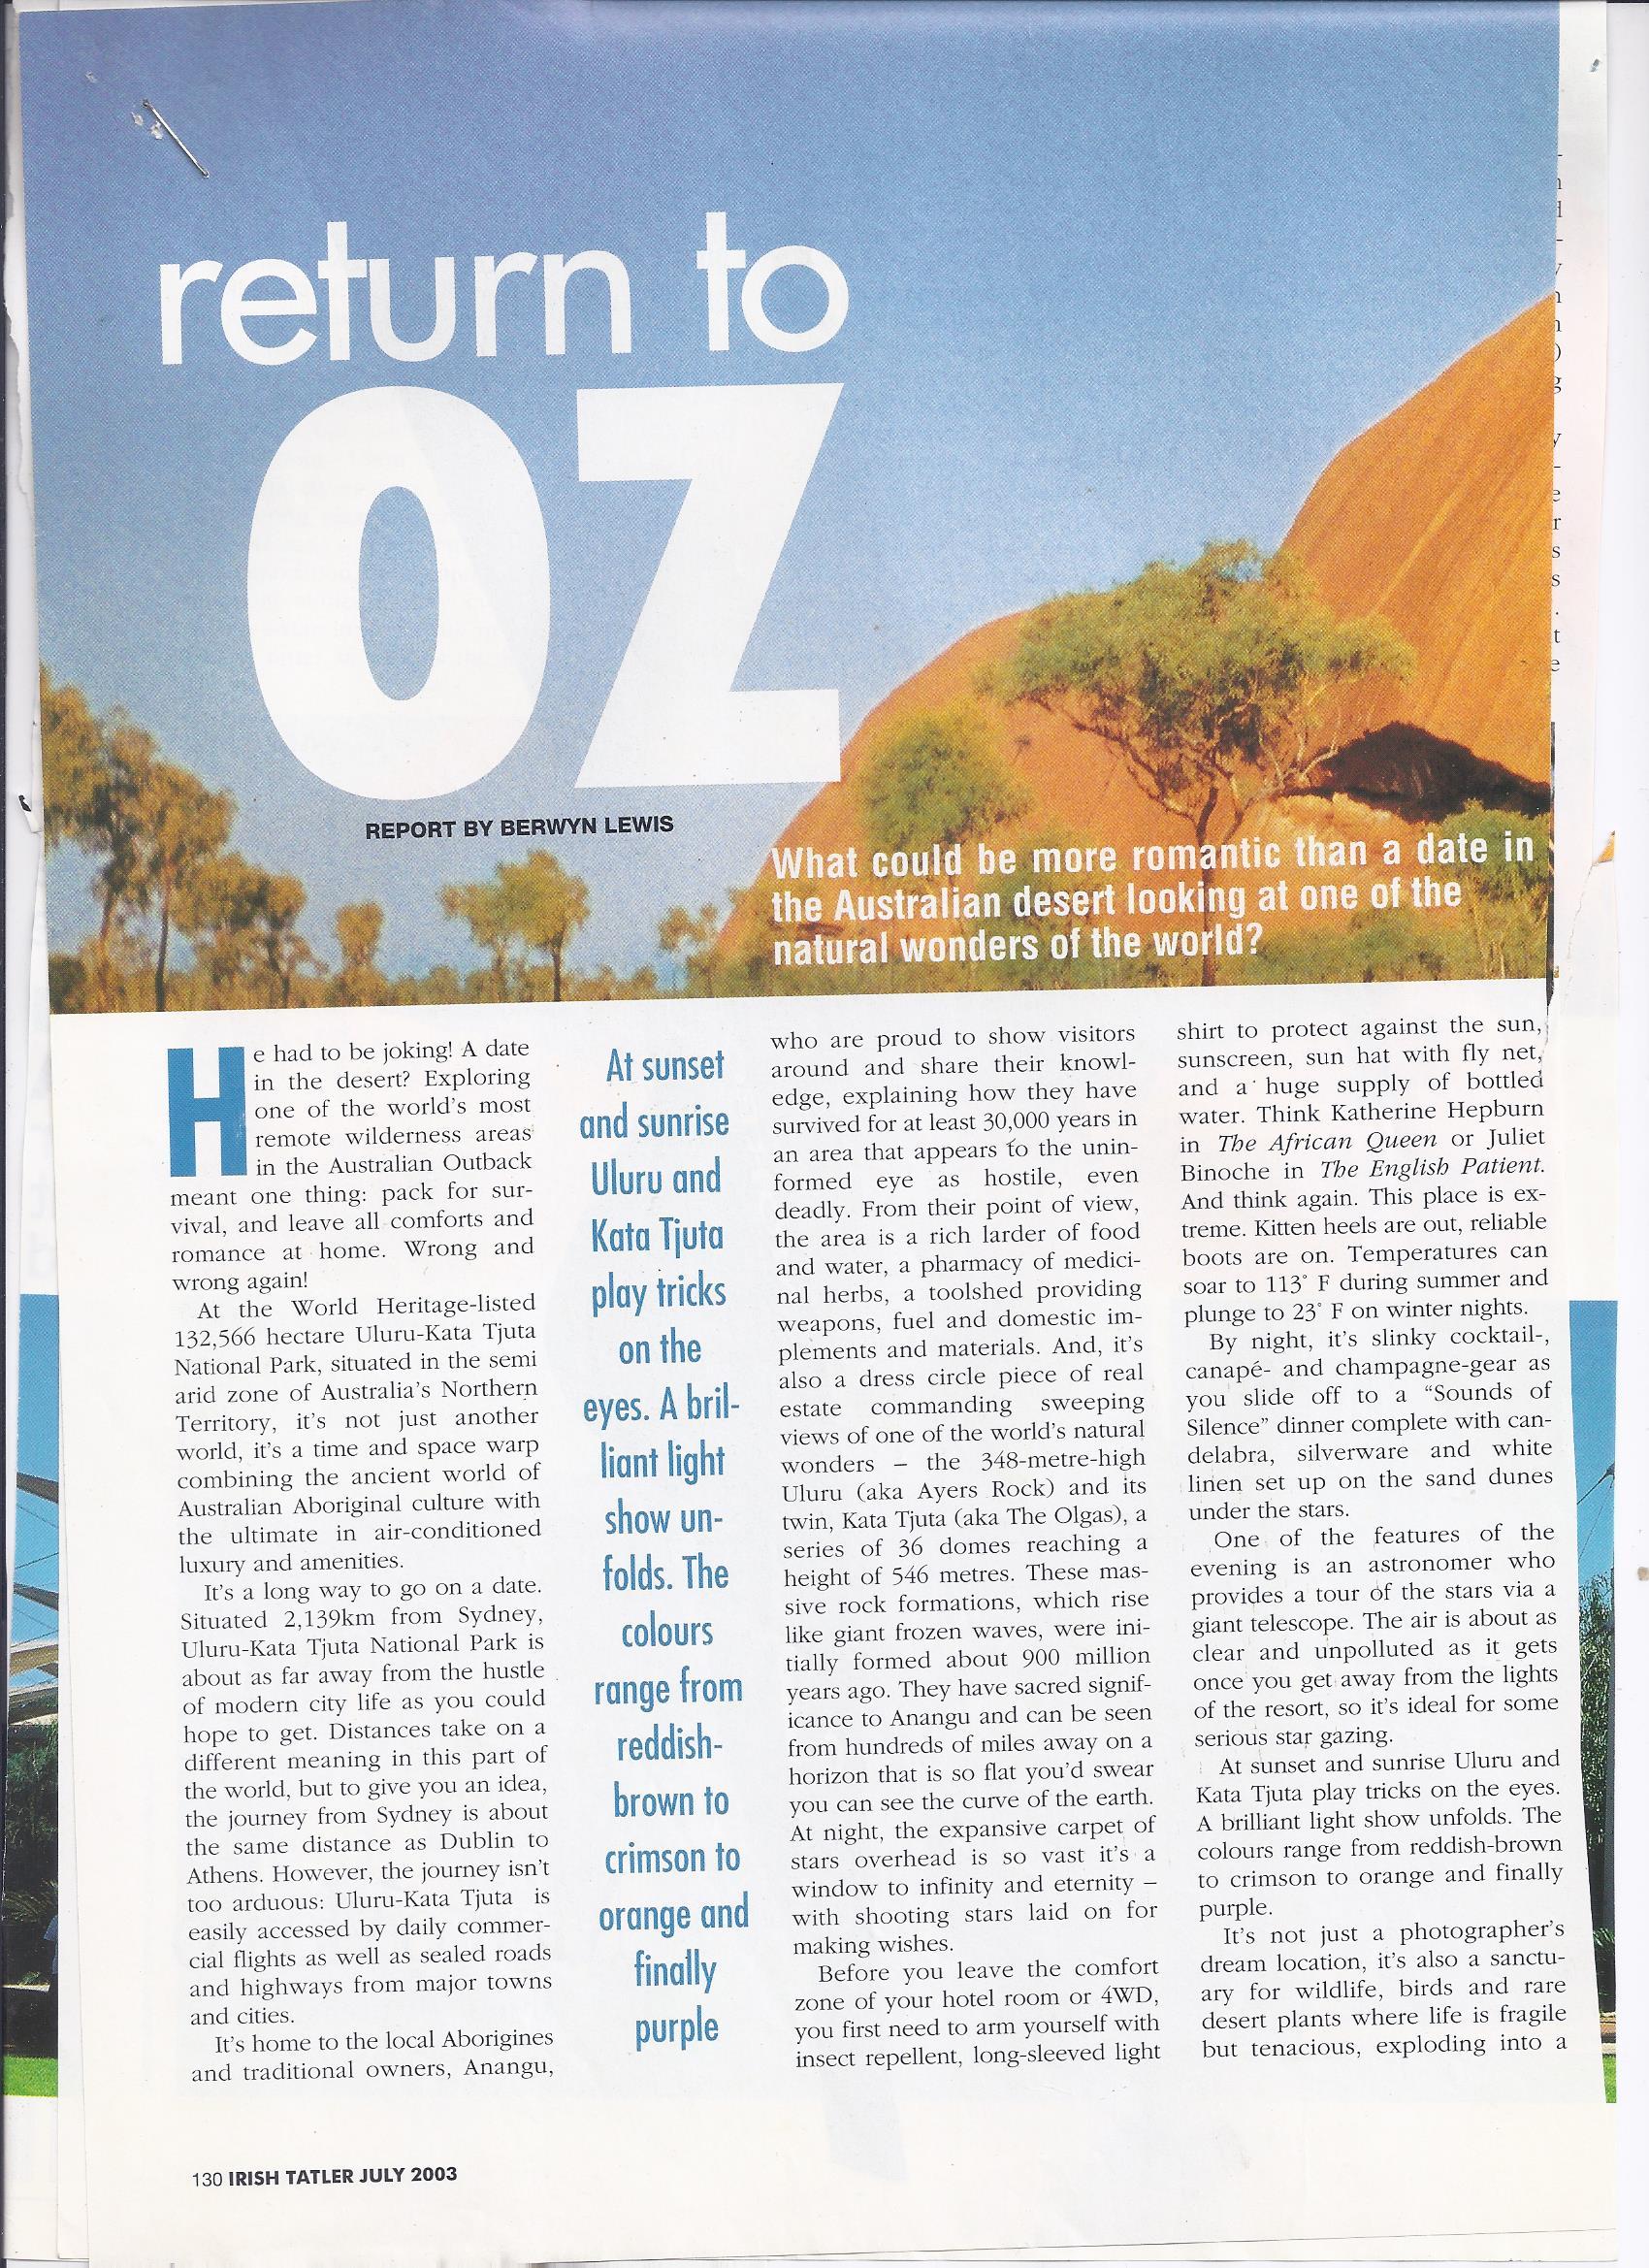 Desert Date Uluru and Kata Tjuta0001.jpg